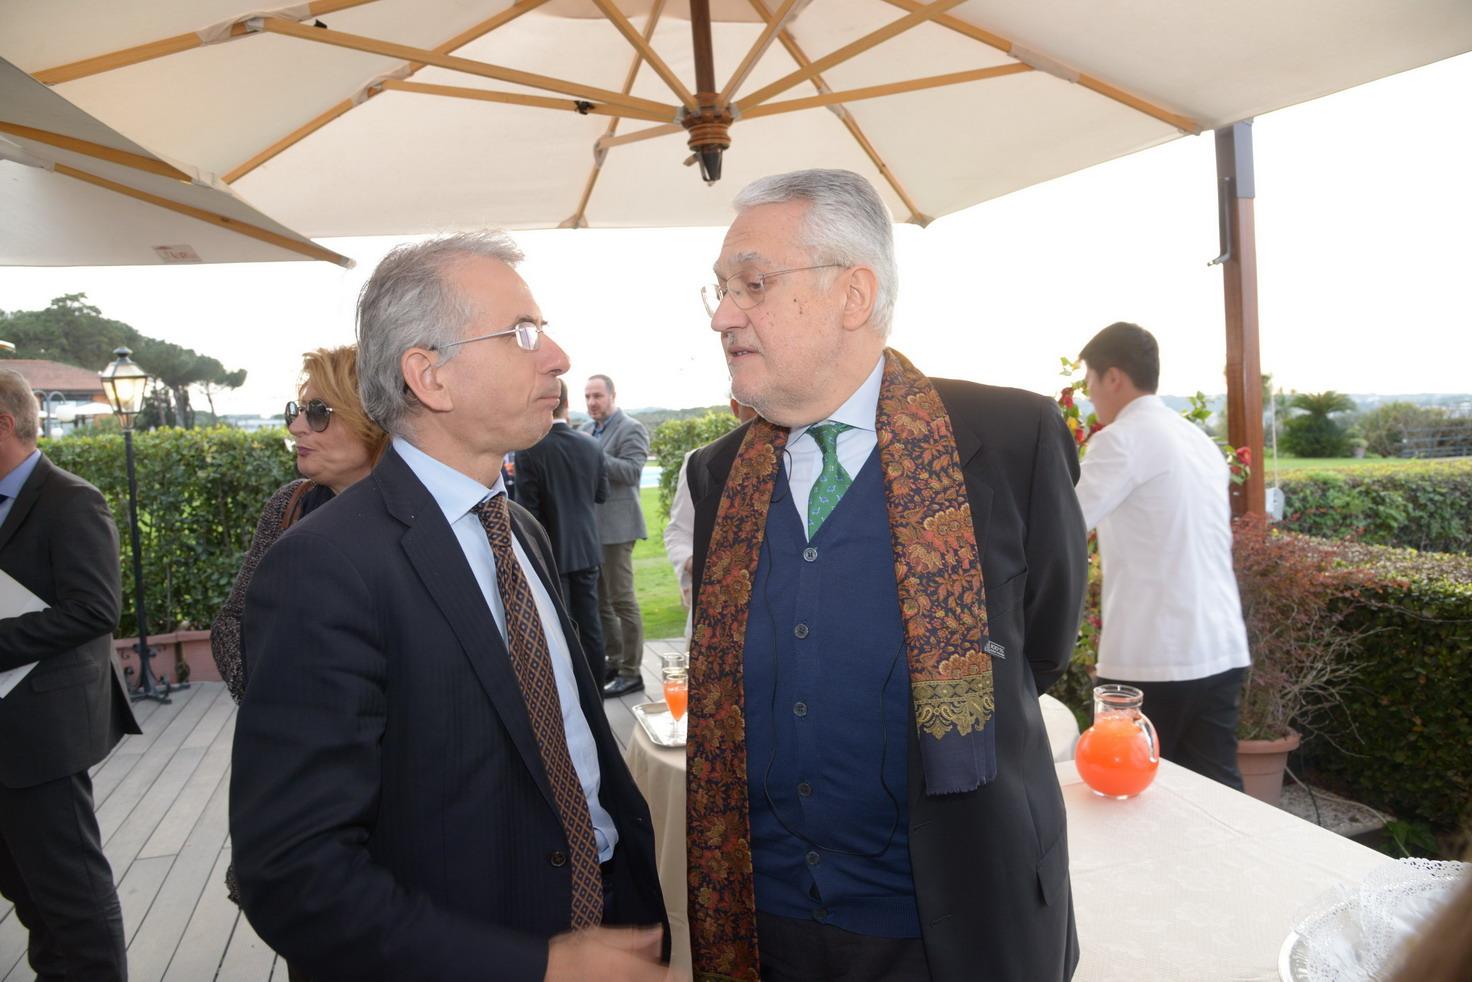 Cosimo Ferri